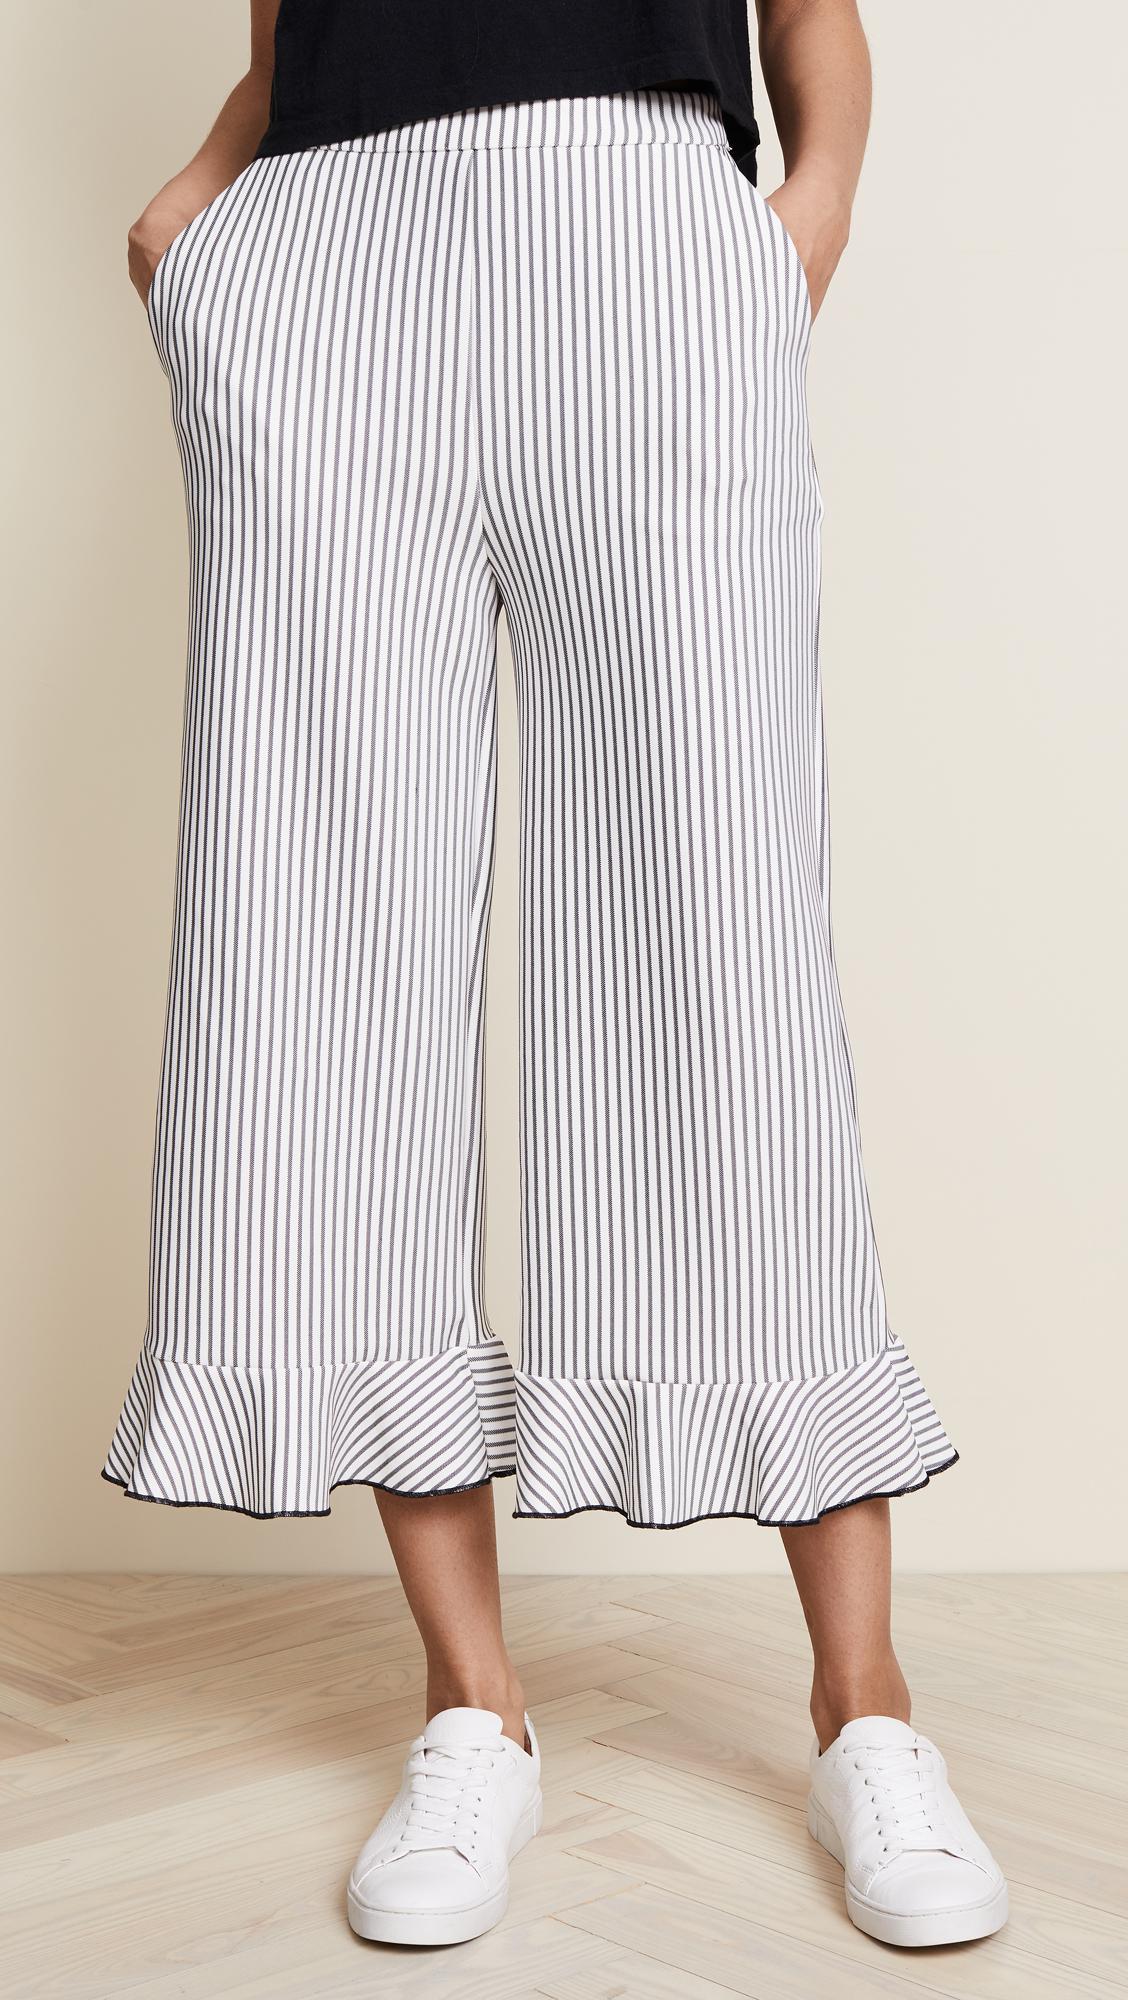 Lowest Price Online Footlocker Finishline Cheap Online Womens Stripe Ruffled Hem Trousers English Factory Mw8c9